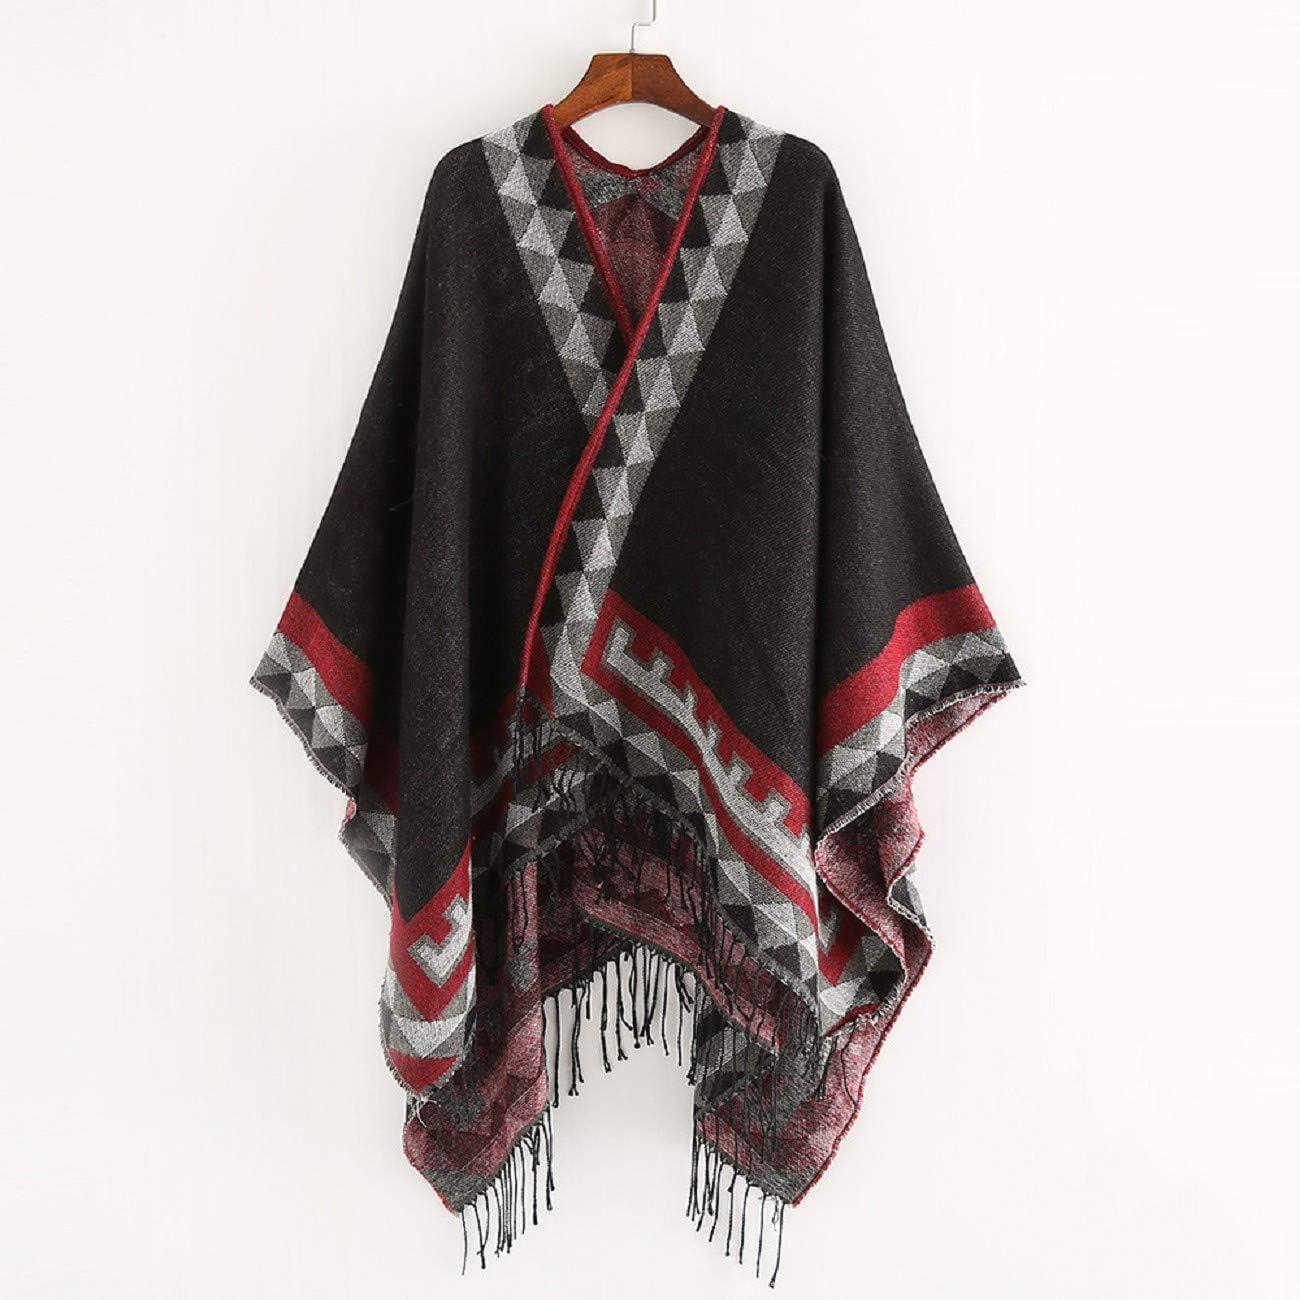 Tsmile Women Soft Cotton Hemp Wrap Shawl Winter Long Scarves Plaid Fringe Evening Long Cashmere Wool Scarf Pashmina